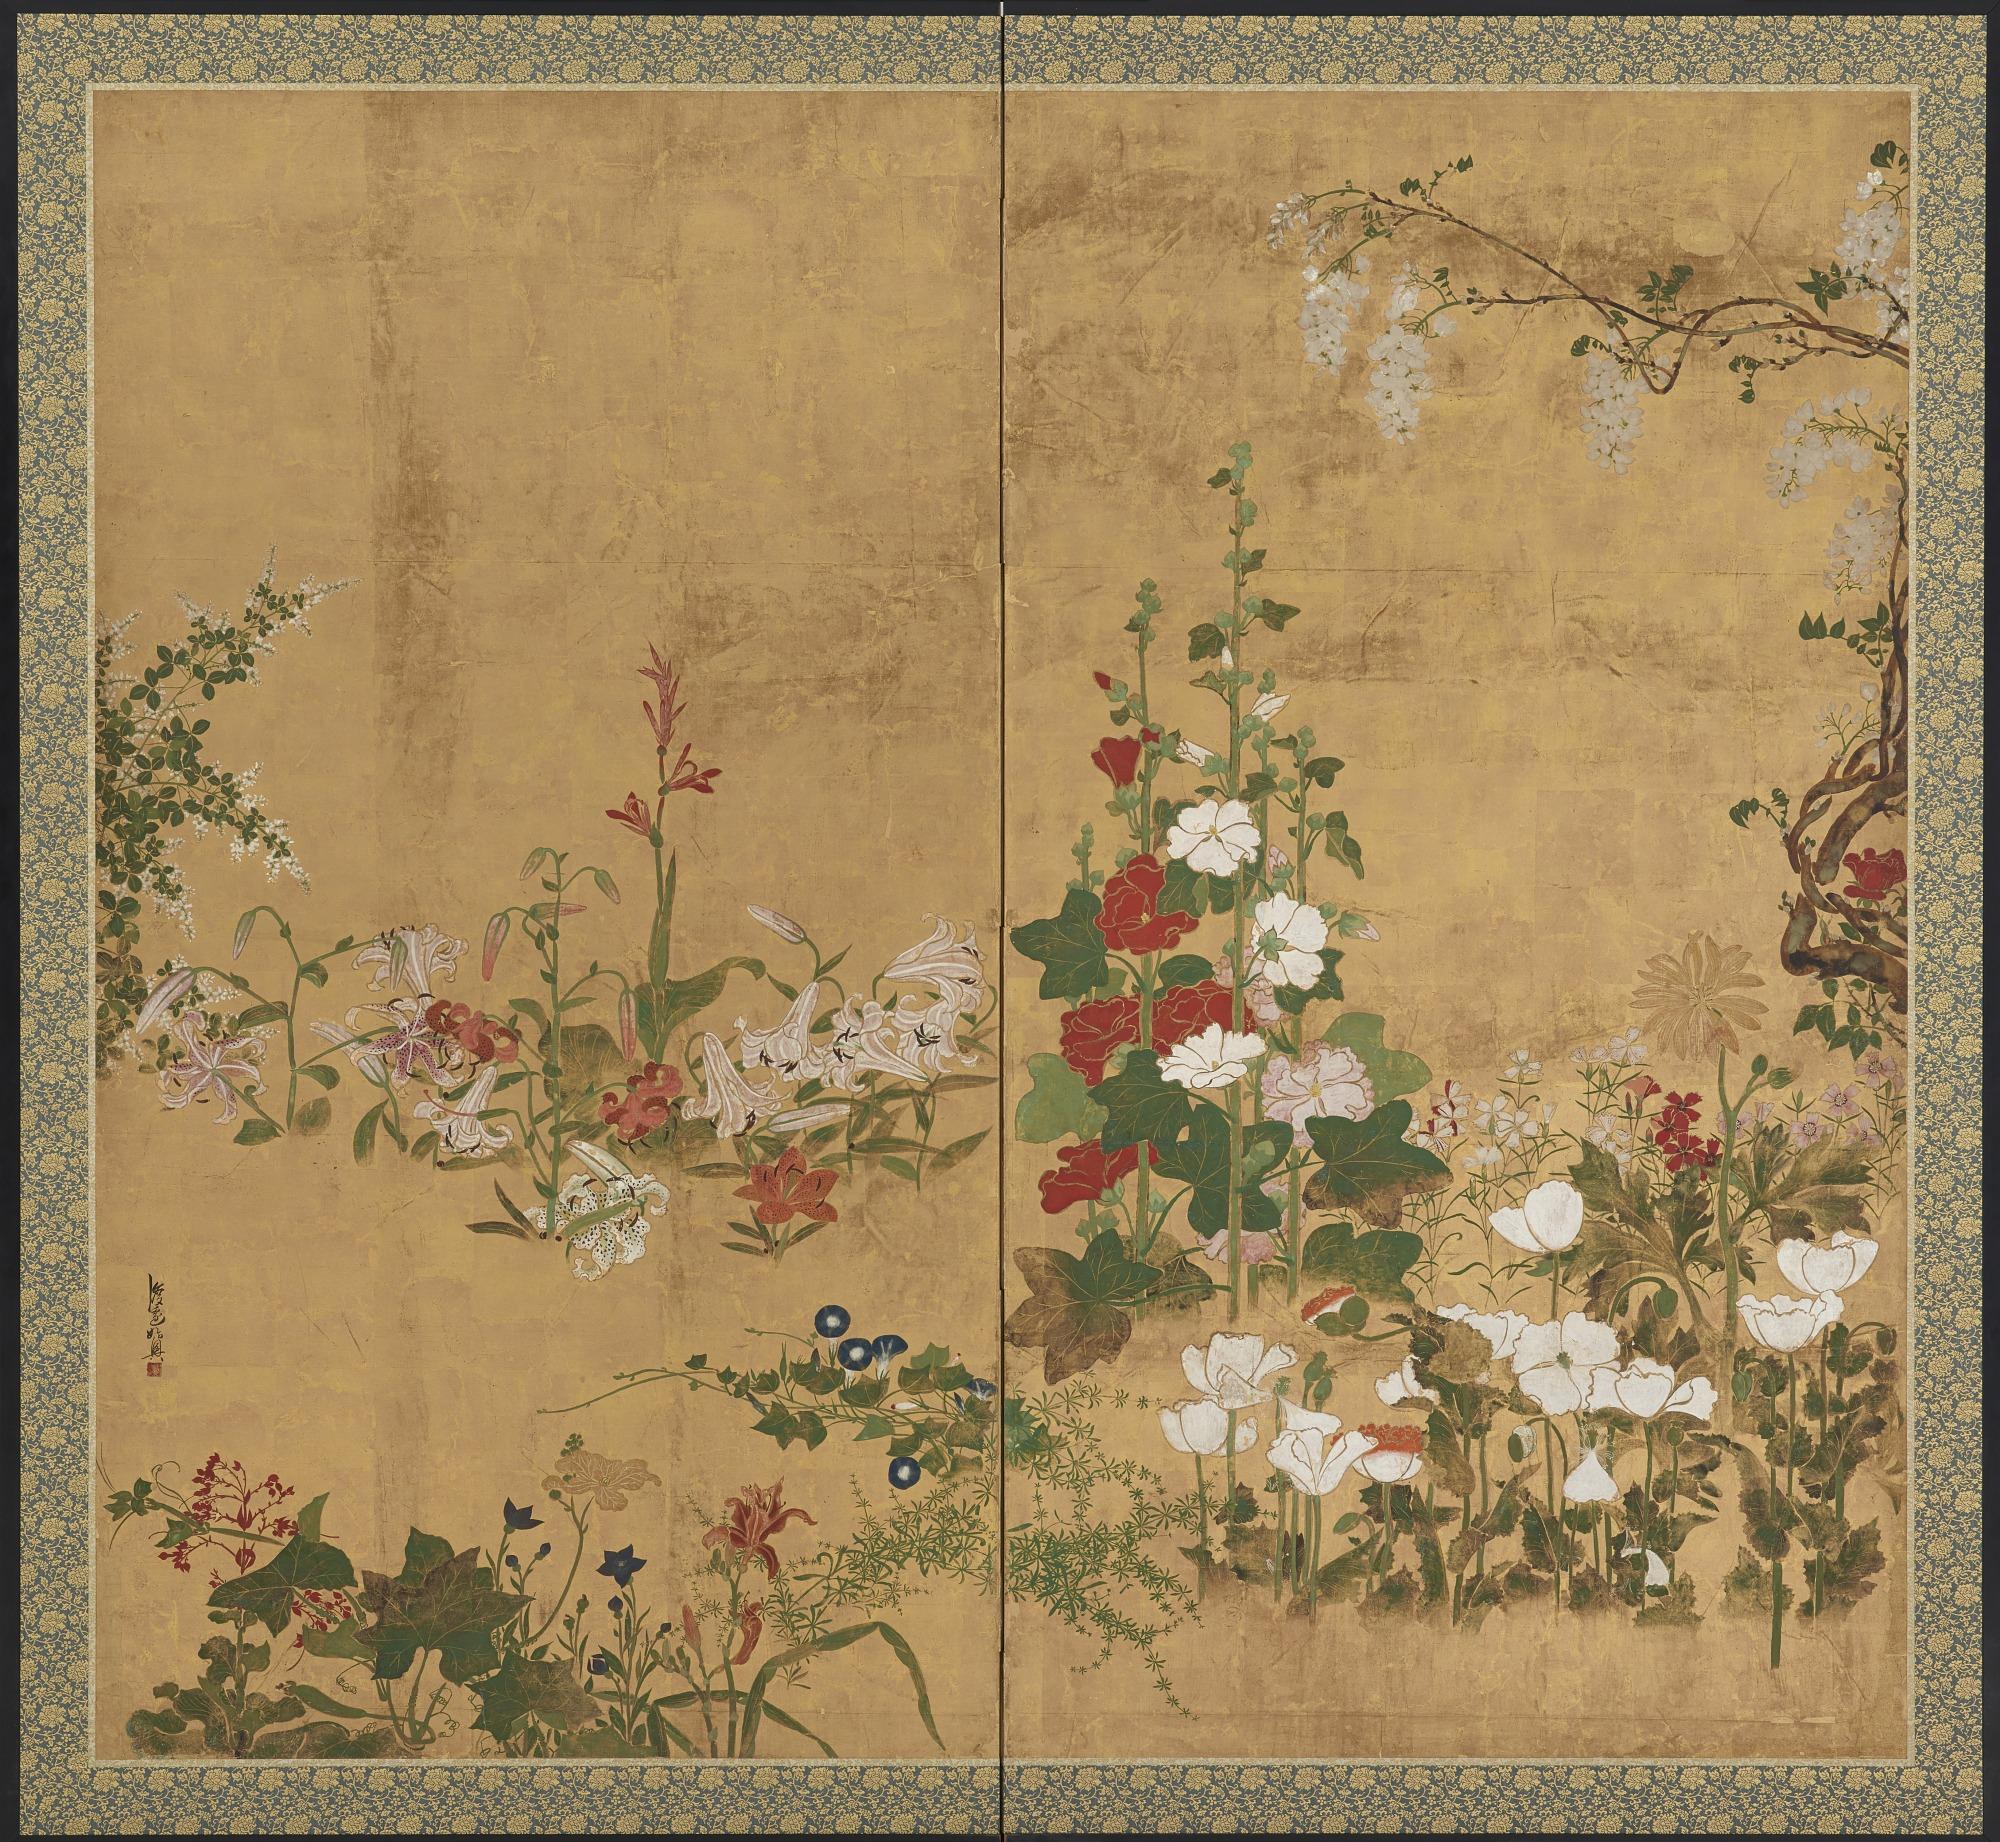 : Flowers